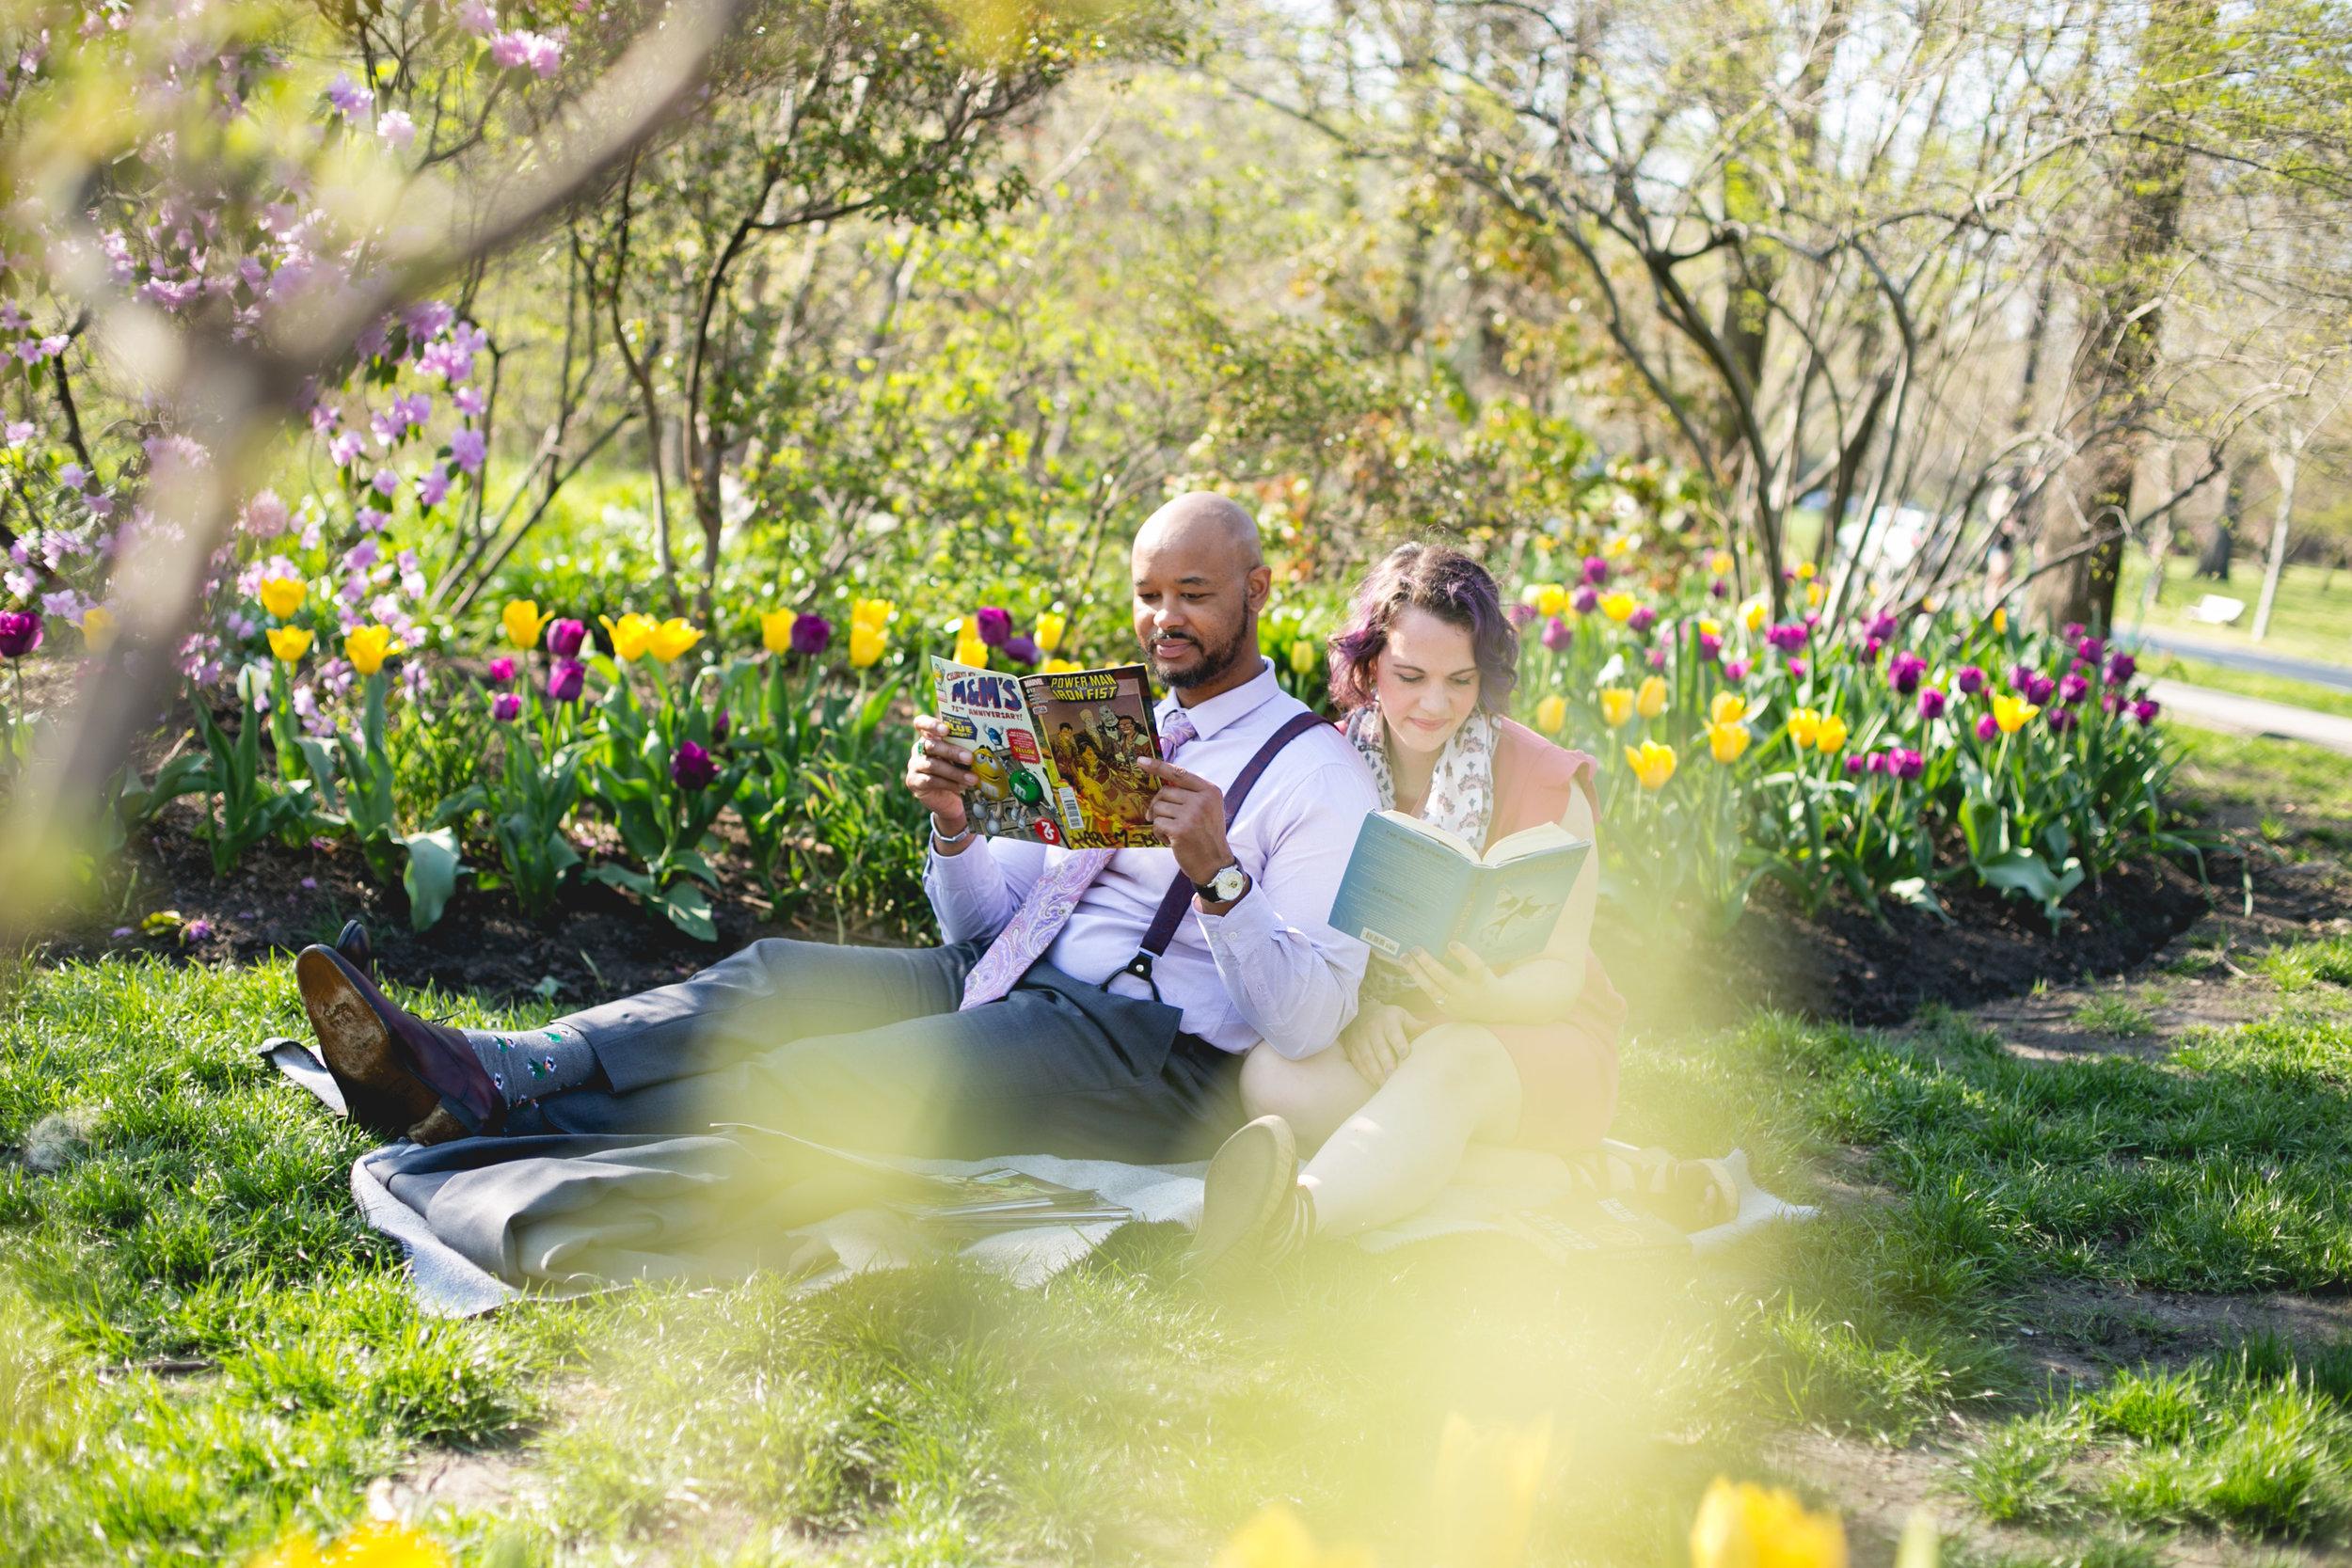 Philadelphia Spring Interacial Vibrant Engagement Shoot 7